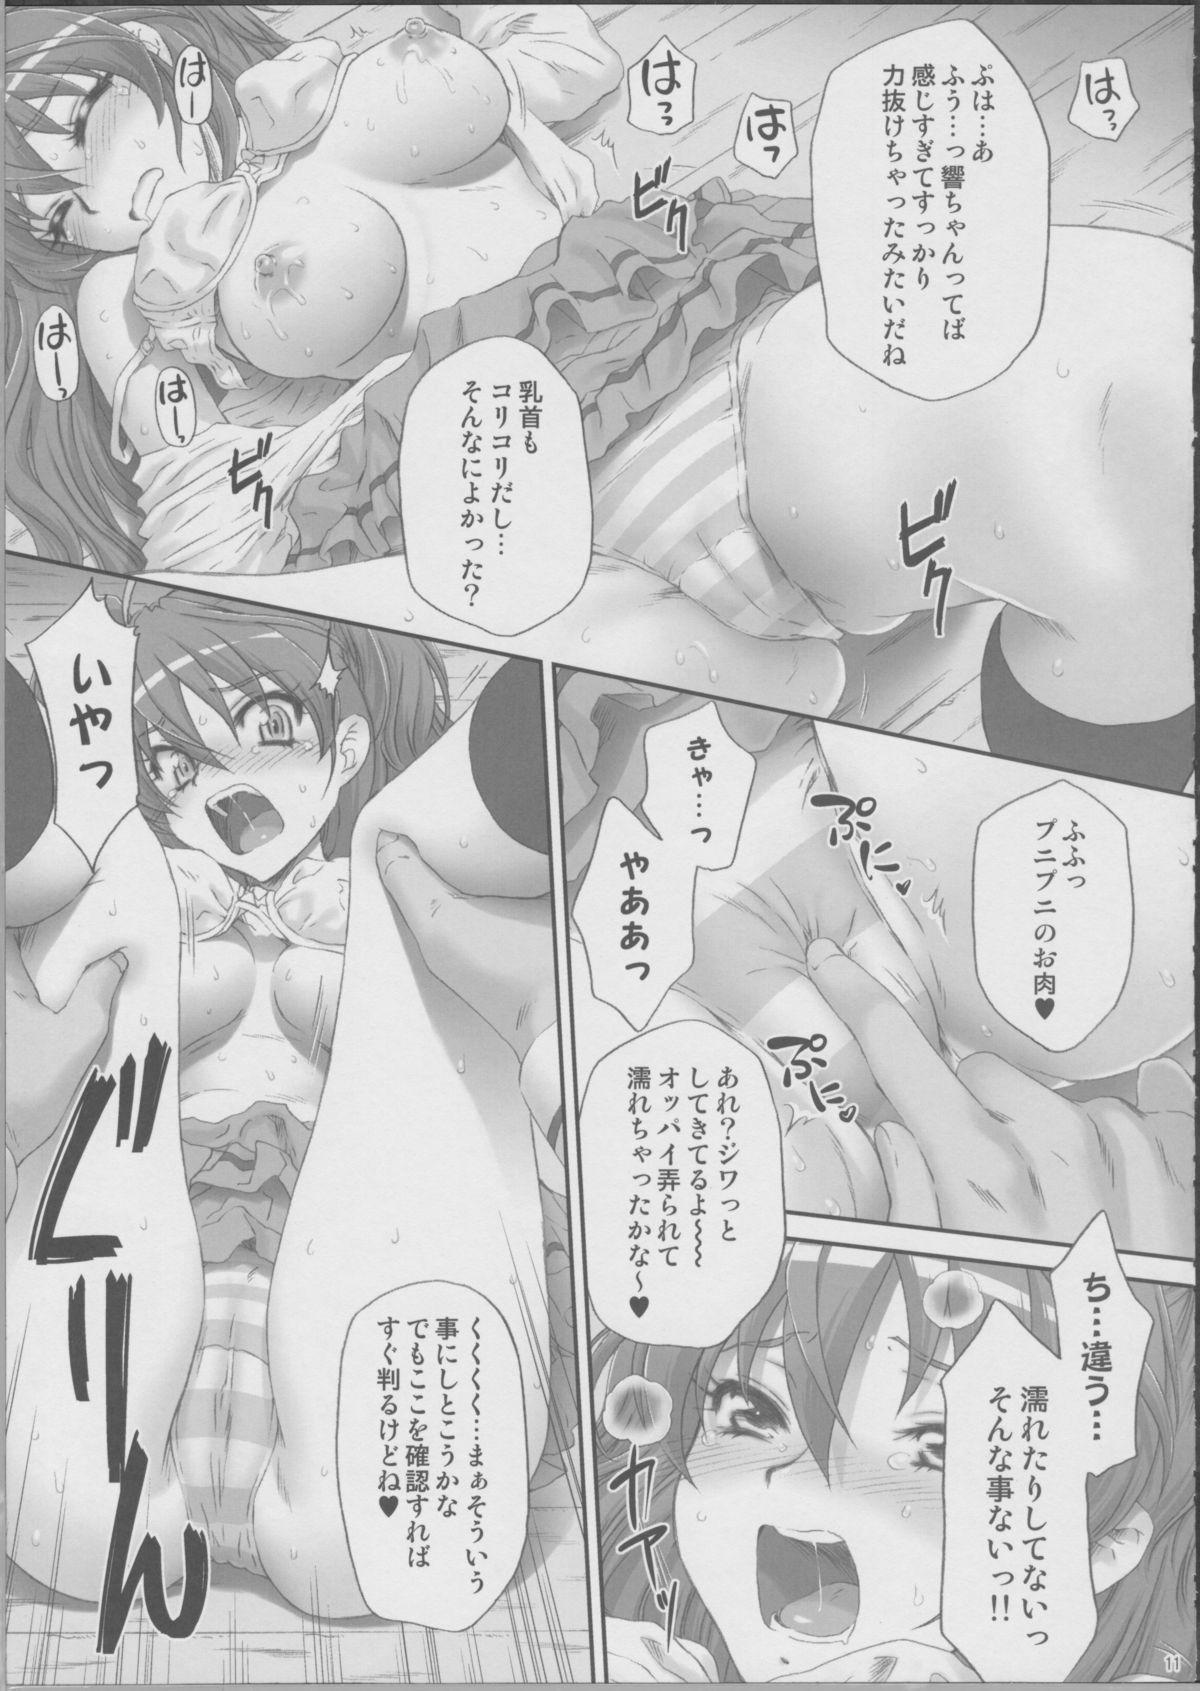 Hibiki de asobou ♪ 9